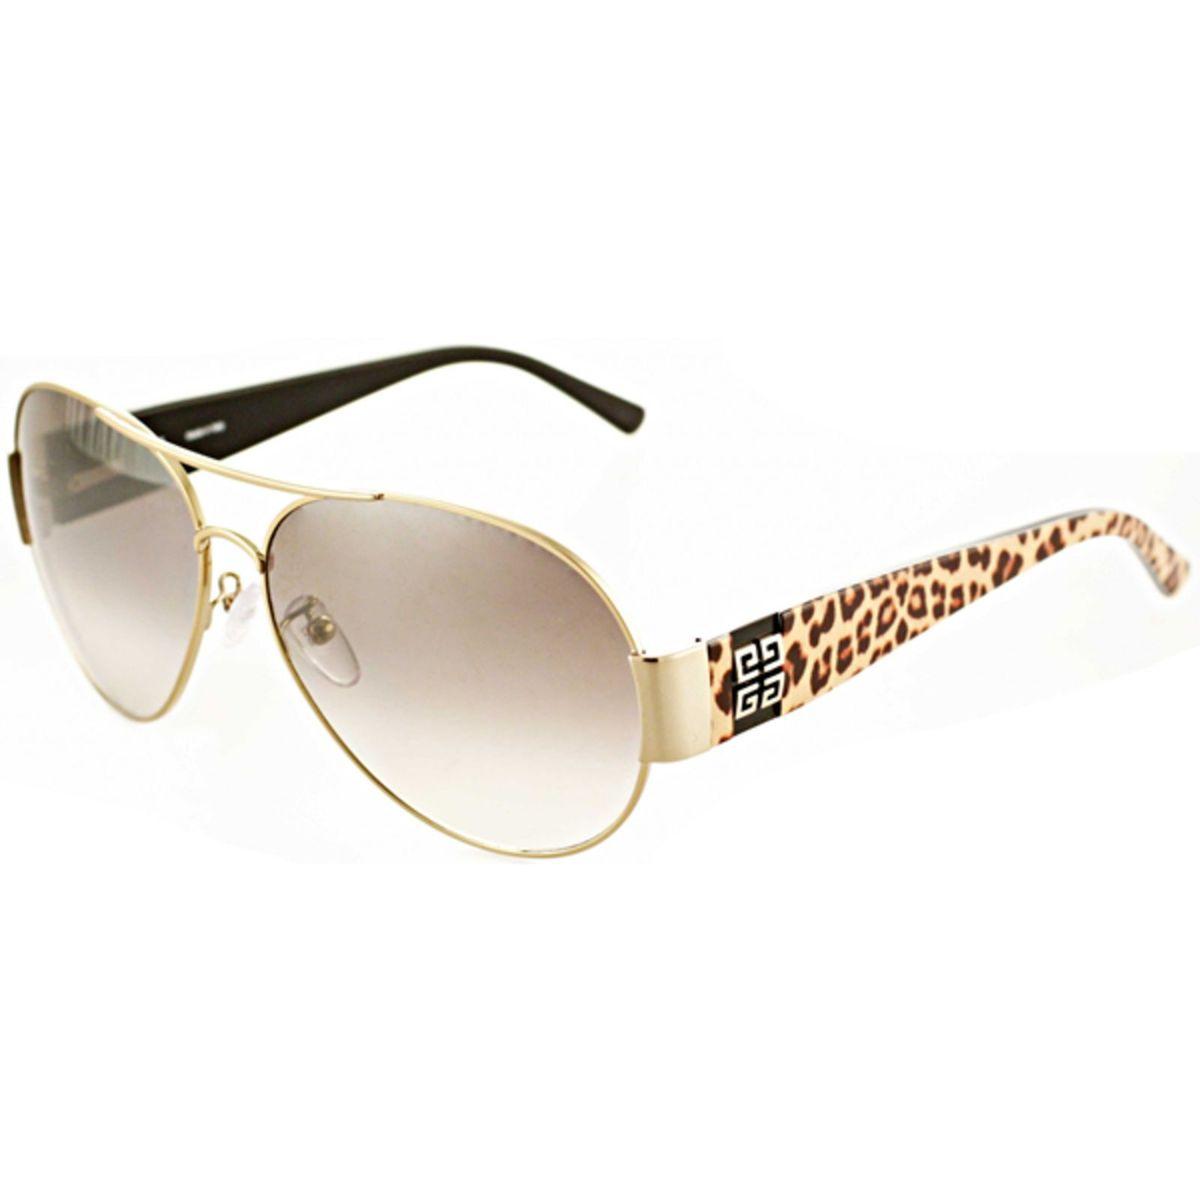 2ebca10e4 Óculos Óculos de Sol Givenchy   Óculos Feminino Givenchy Nunca Usado 616085    enjoei